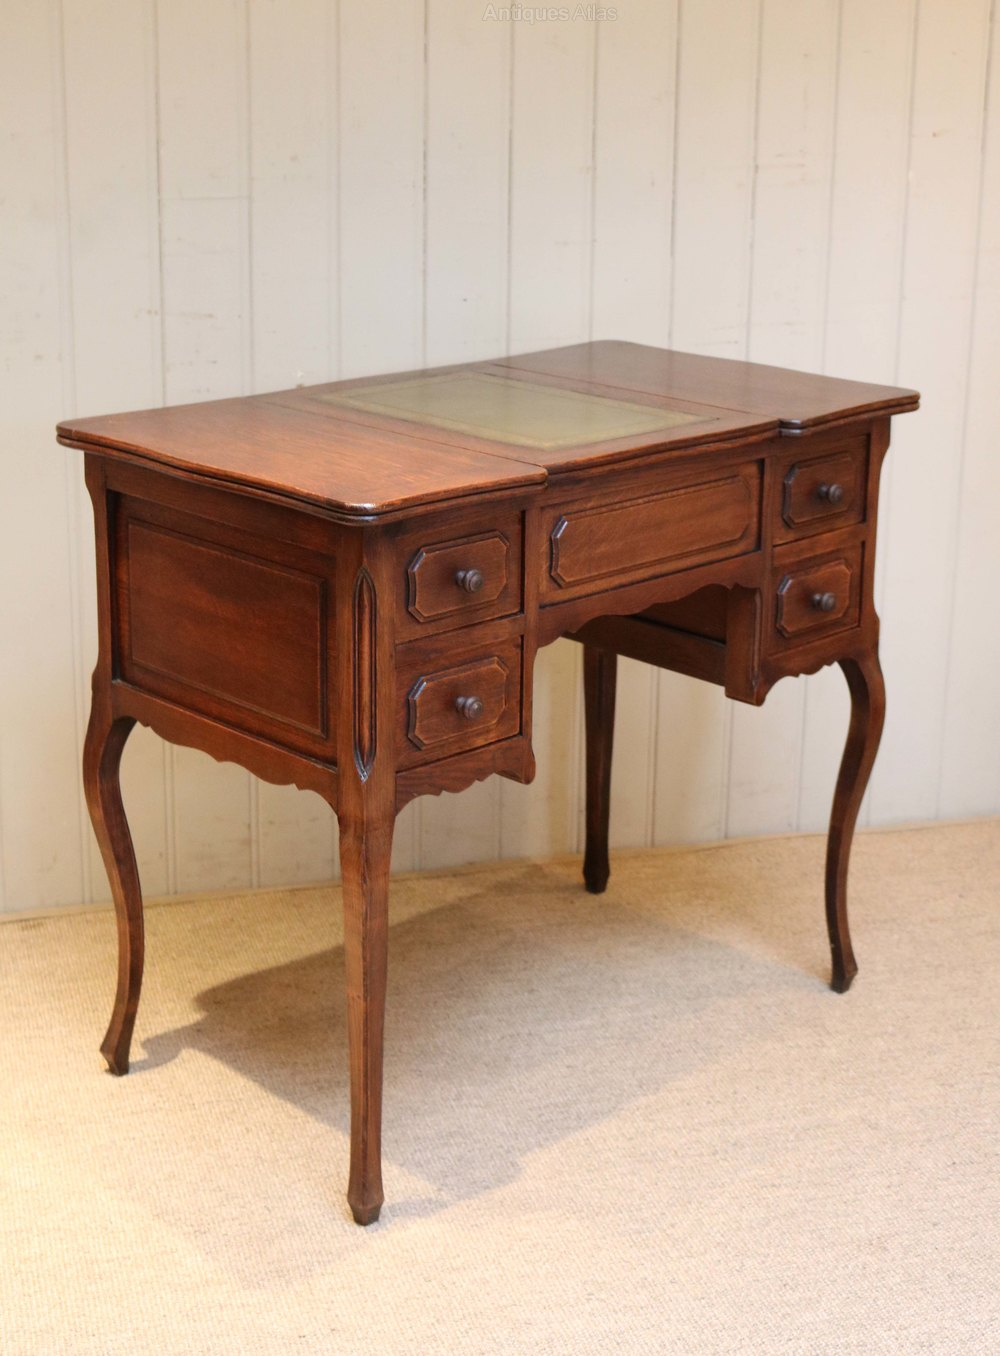 Small French Oak Desk Antique Desks ... - Small French Oak Desk - Antiques Atlas